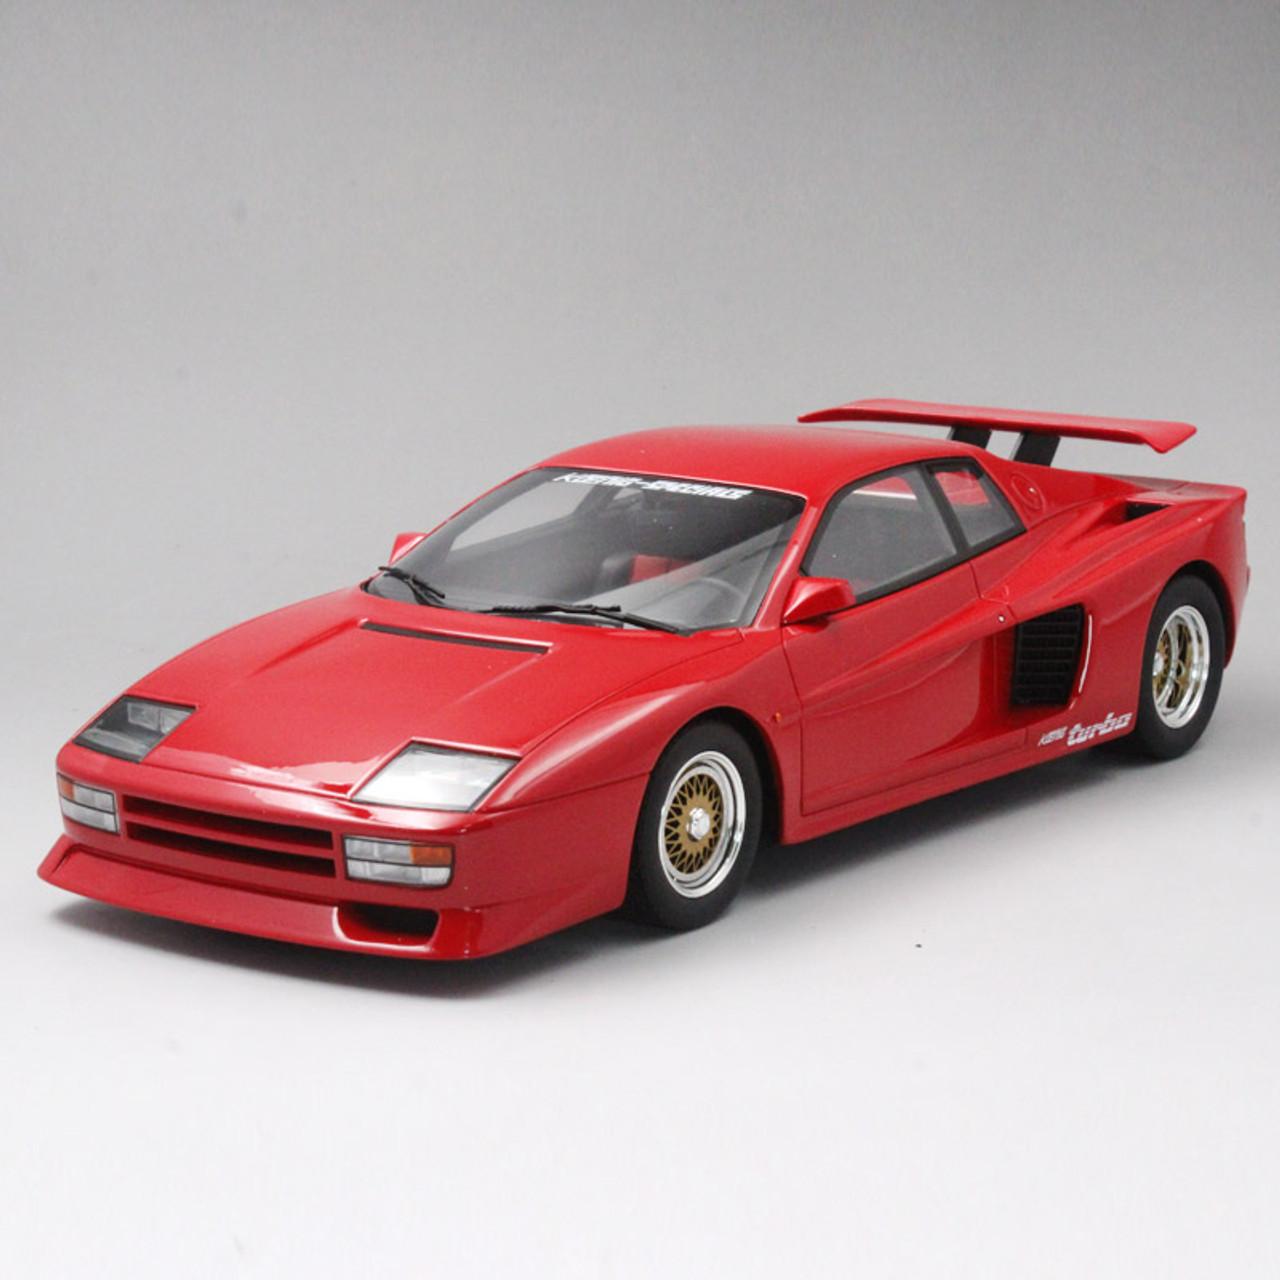 1 18 Gt Spirit Gtspirit 1991 Ferrari Testarossa Koenig Turbo F48 Red Resin Model Livecarmodel Com